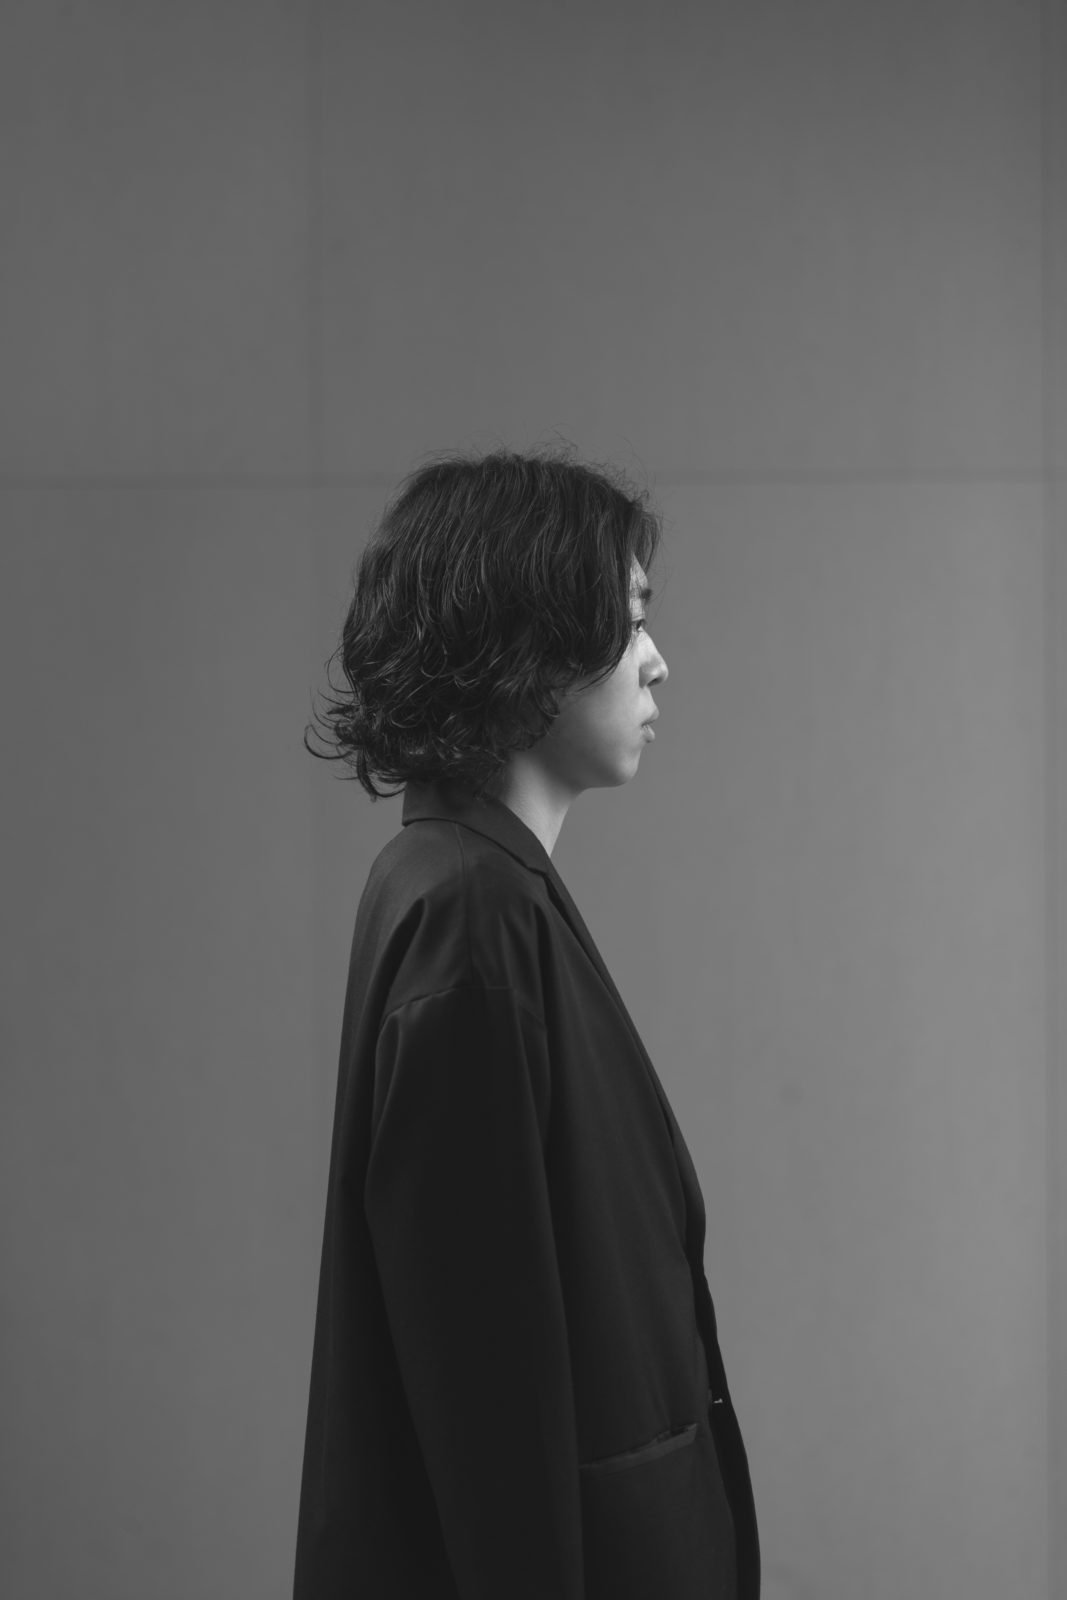 Harada Naoyuki